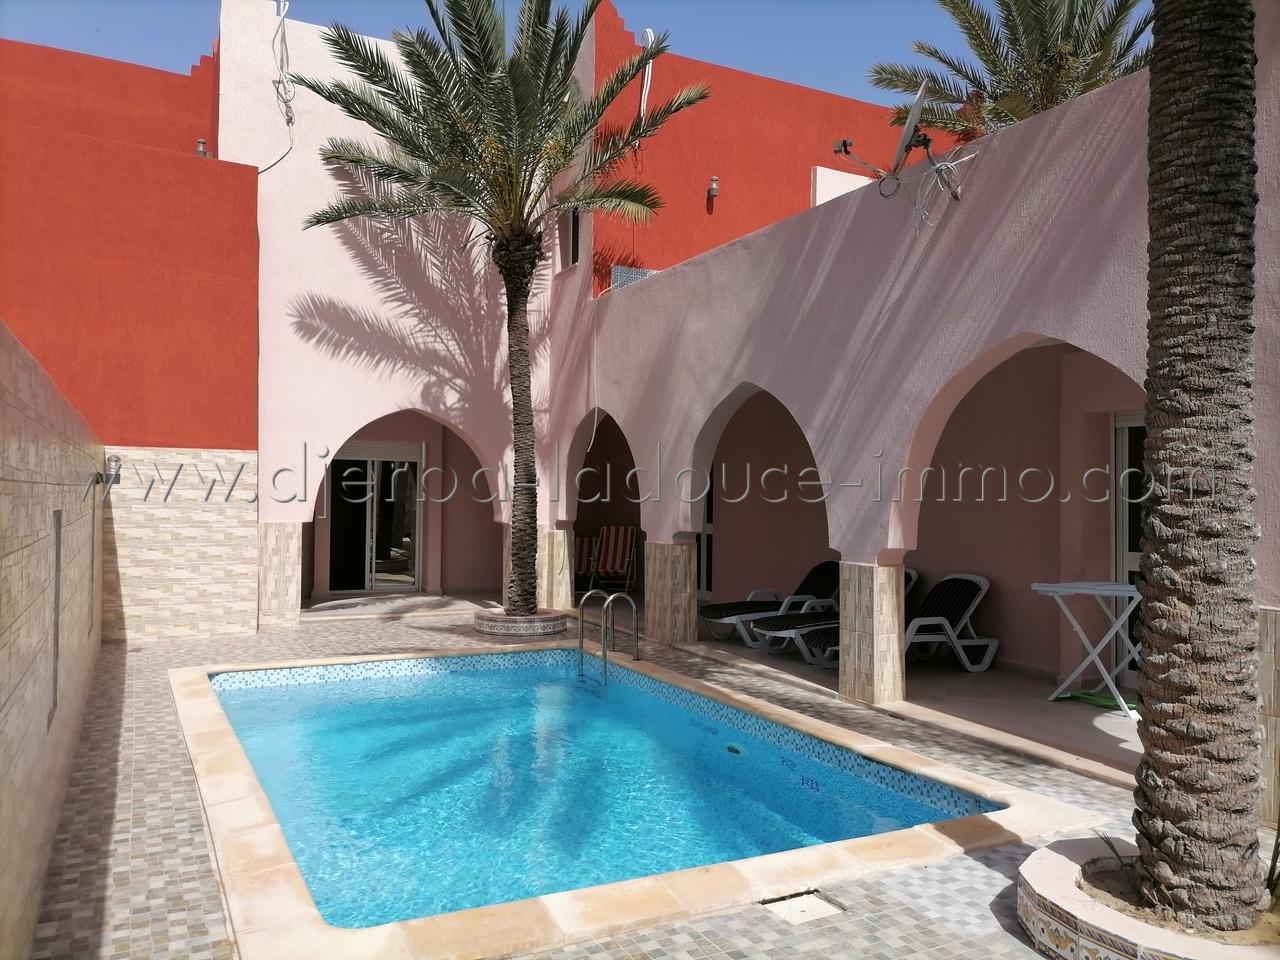 Une Belle Villa Style Marocain avec Piscine & meublée à Louer à Djerba Midoun Mguersa